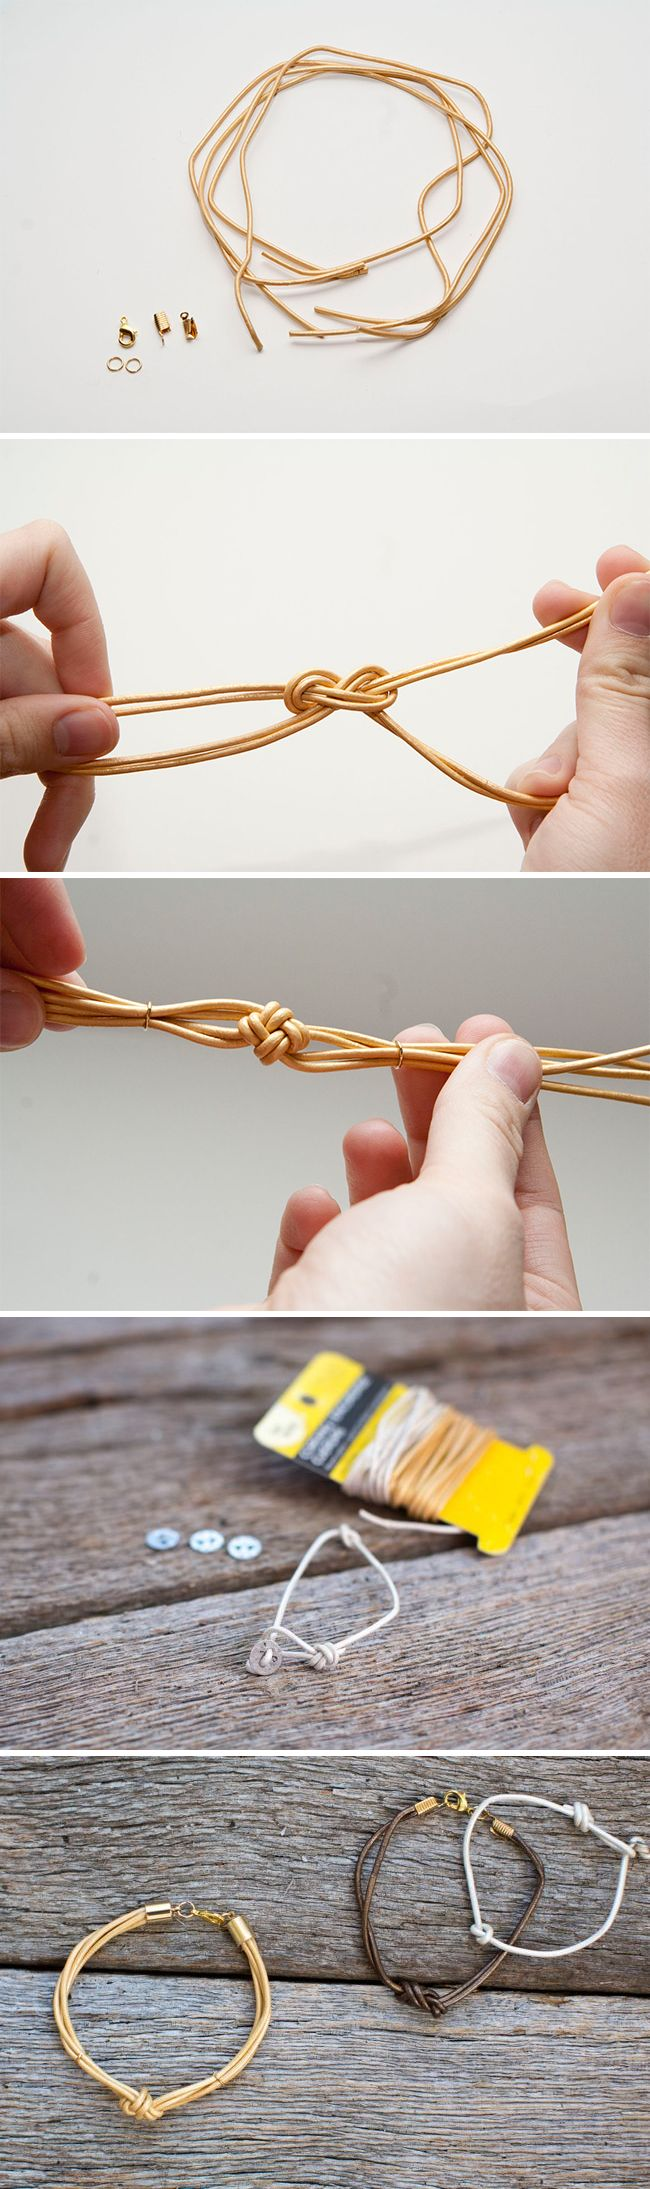 DIY: knotted leather bracelets Armband aus Leder knüpfen und binden - DIY Selbermachen